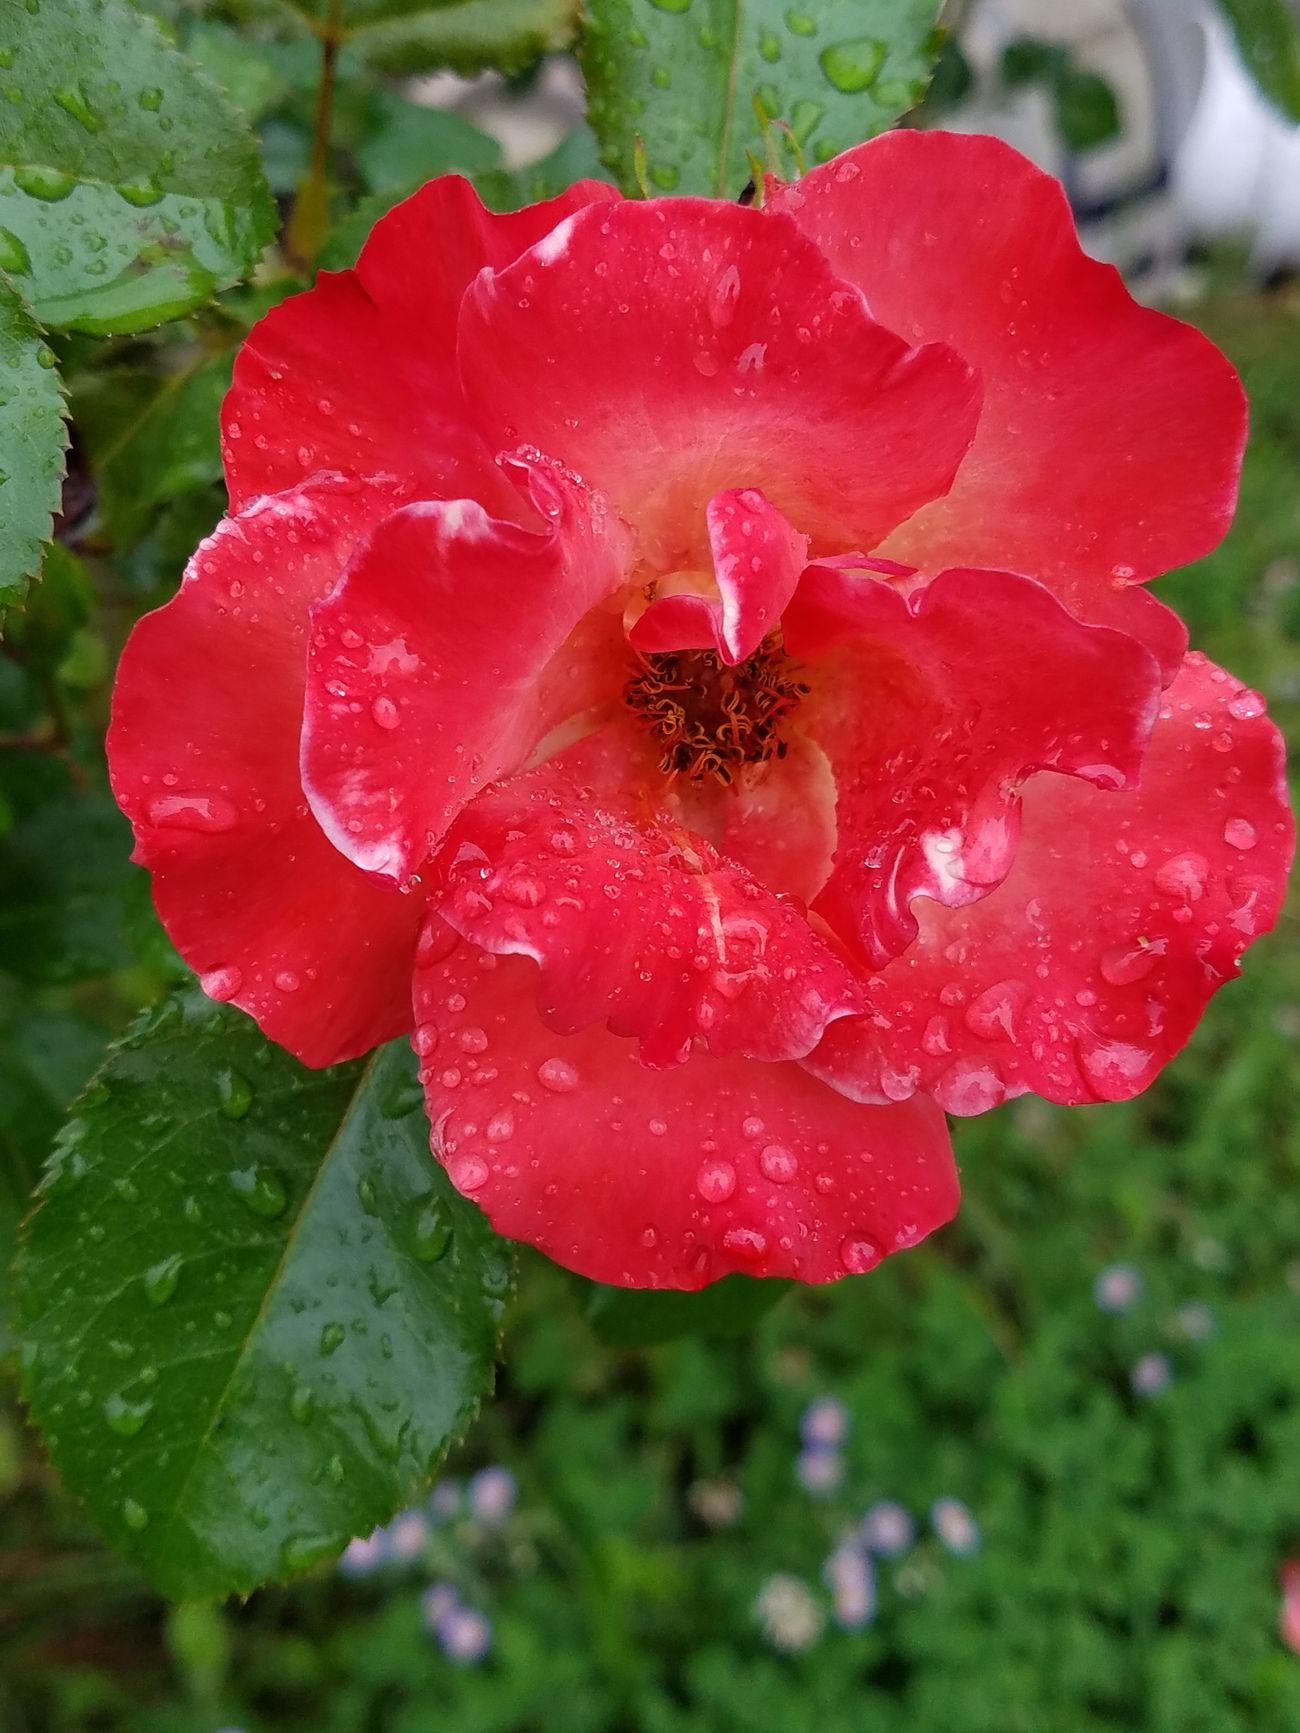 Rainy rose Ujustgotkaied Nature Flowers Dewdrop Dew Rain Roses Garden Petals